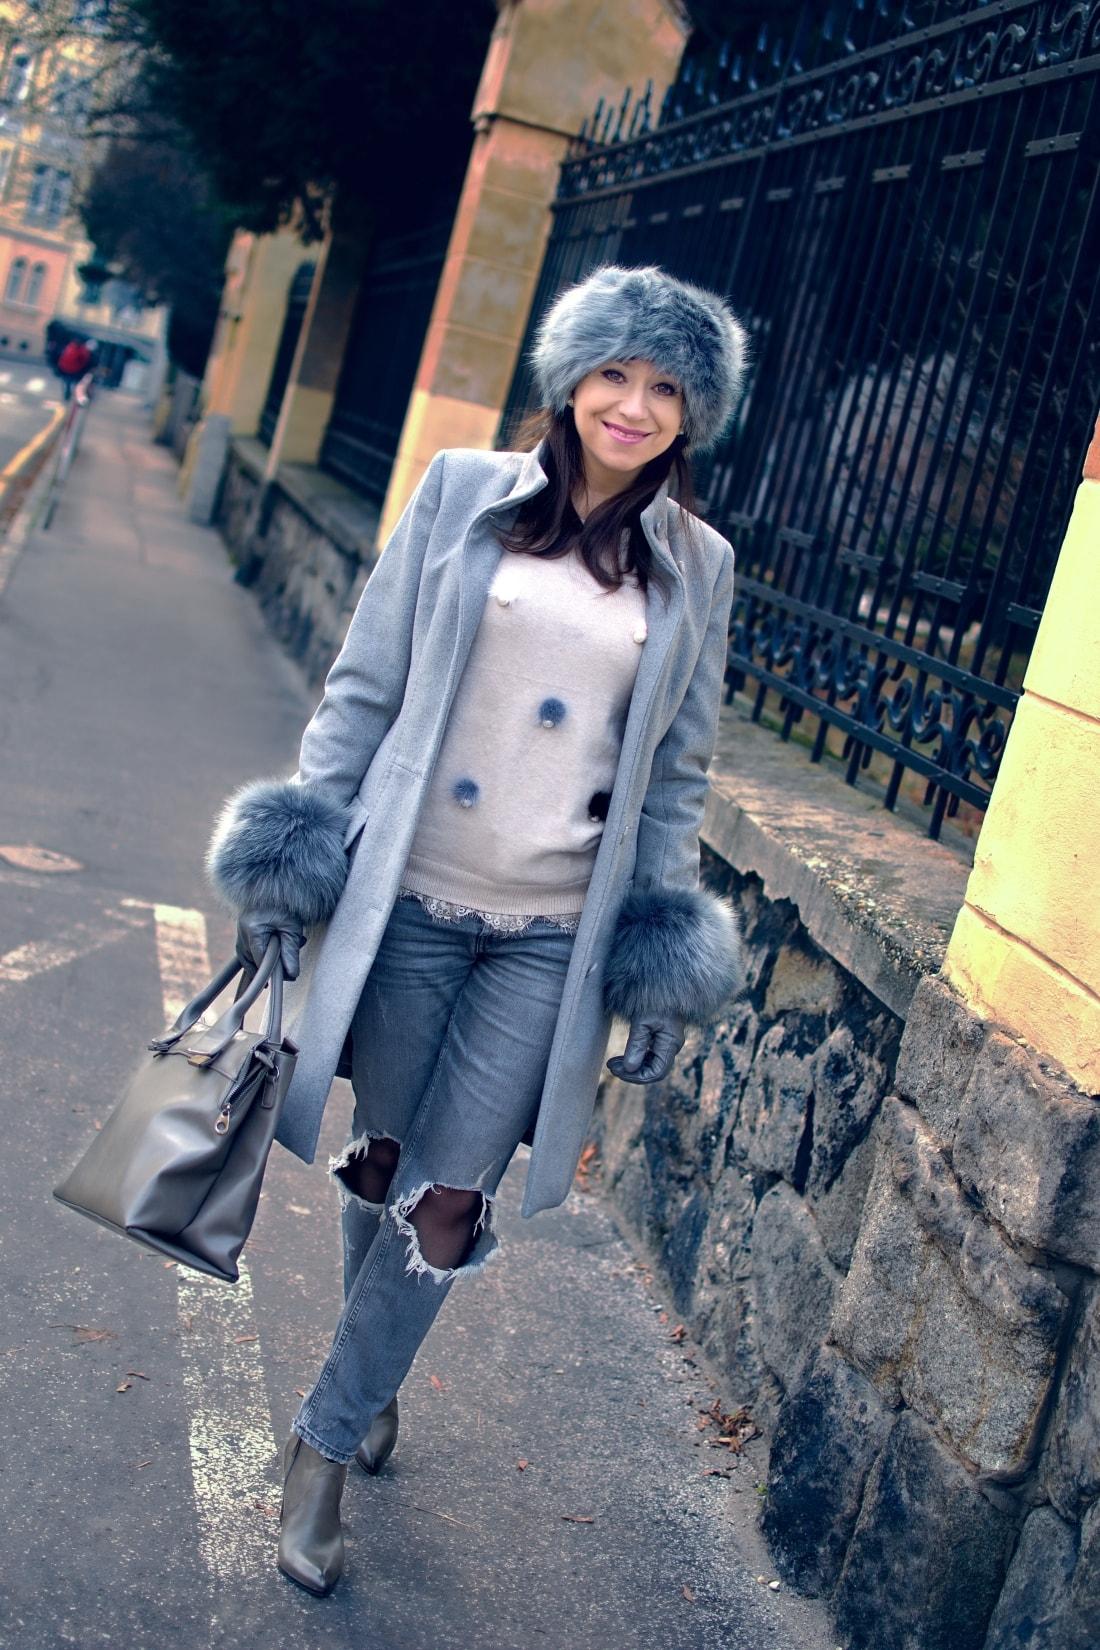 Kožušinové doplnky_Katharine-fashion is beautiful_blog 2_Sivý kabát_Roztrhané džínsy Zara_Katarína Jakubčová_Fashion blogger